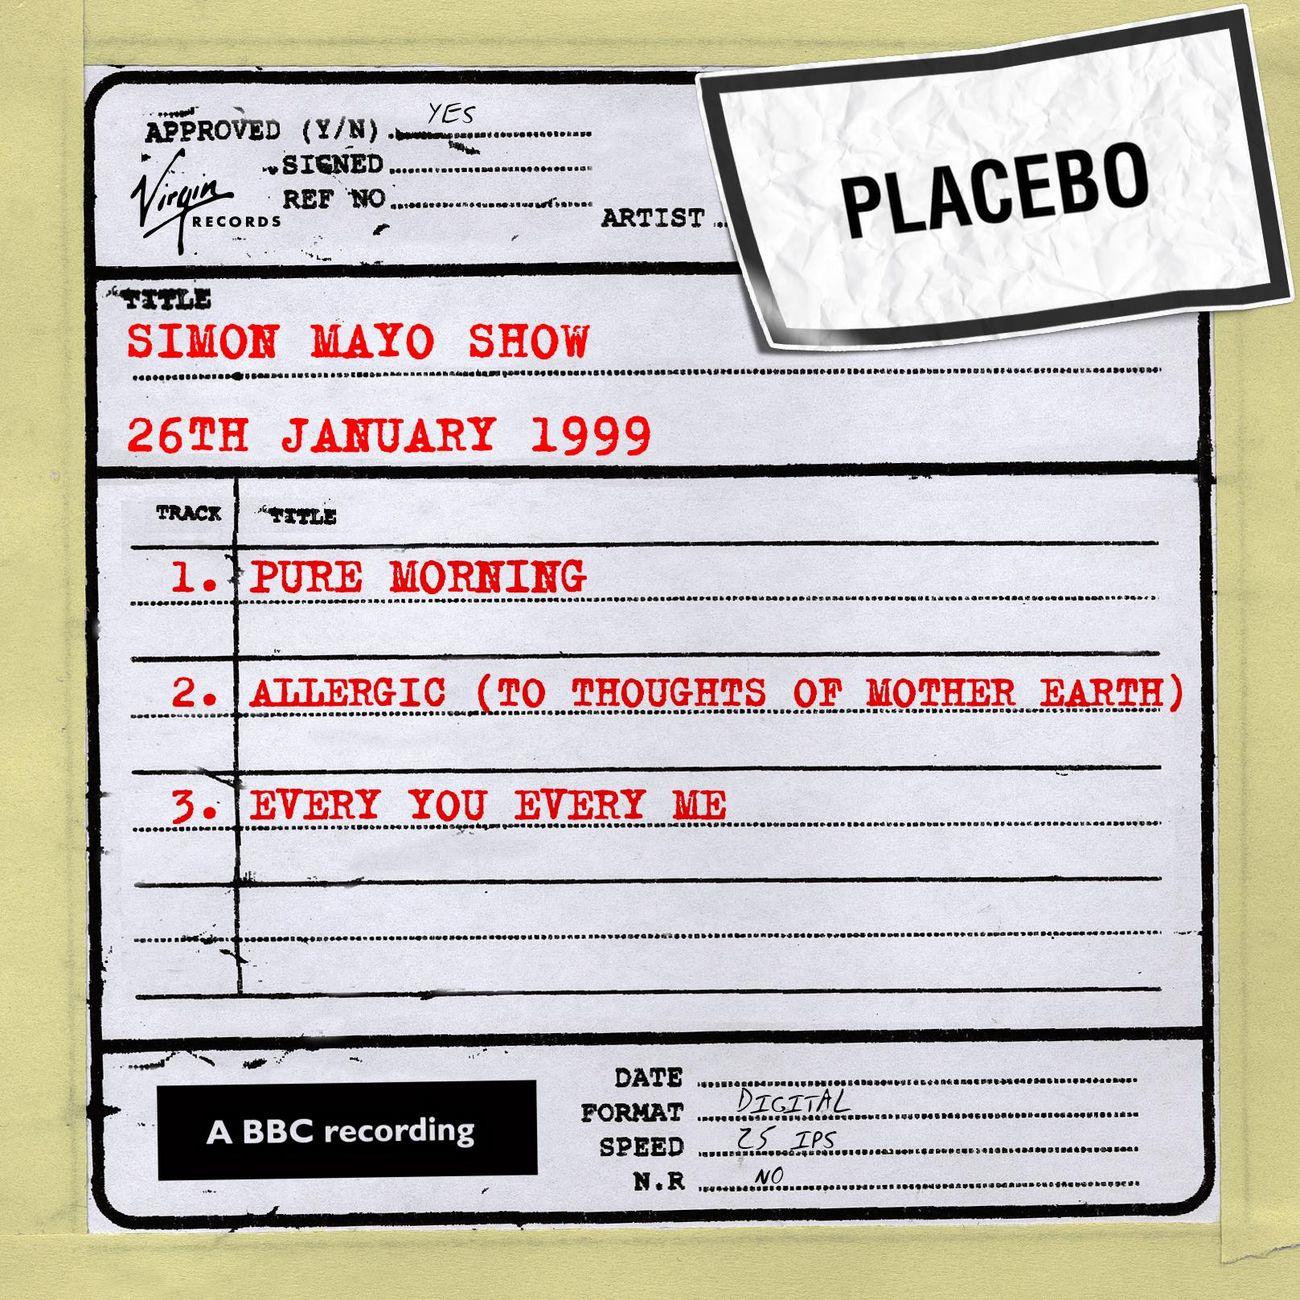 Simon Mayo Show (26th january 1999)